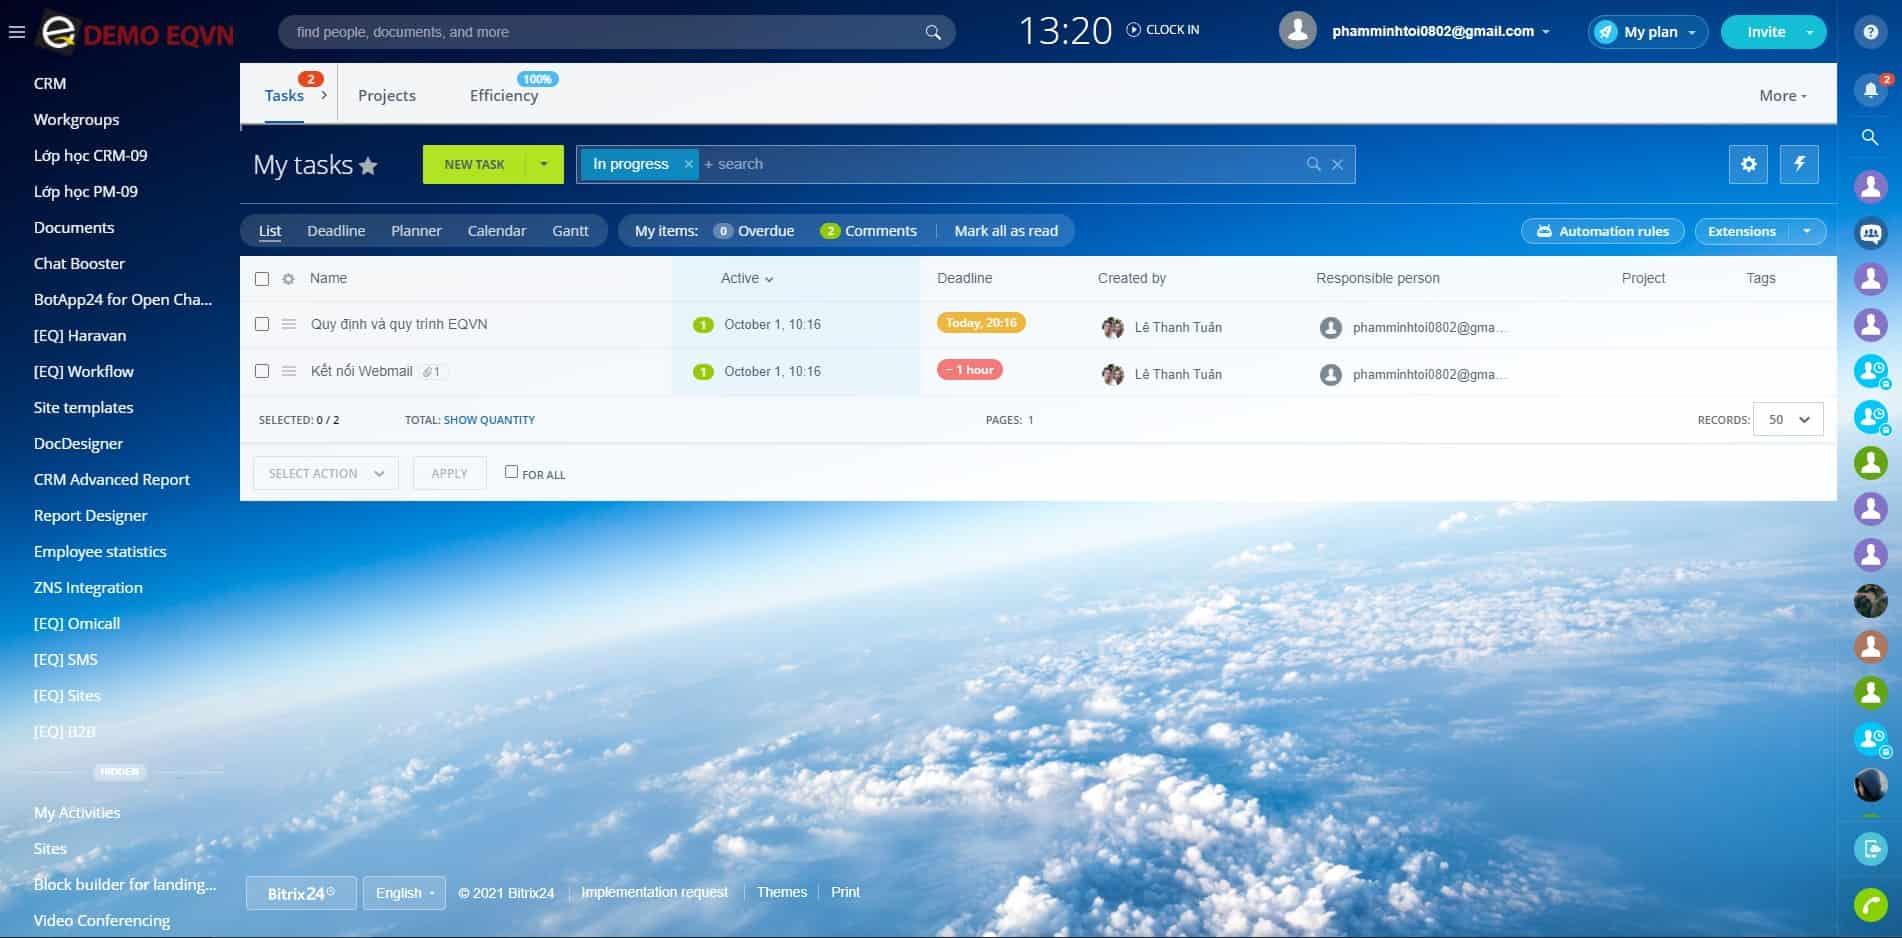 Screenshot 2021-10-01 132047